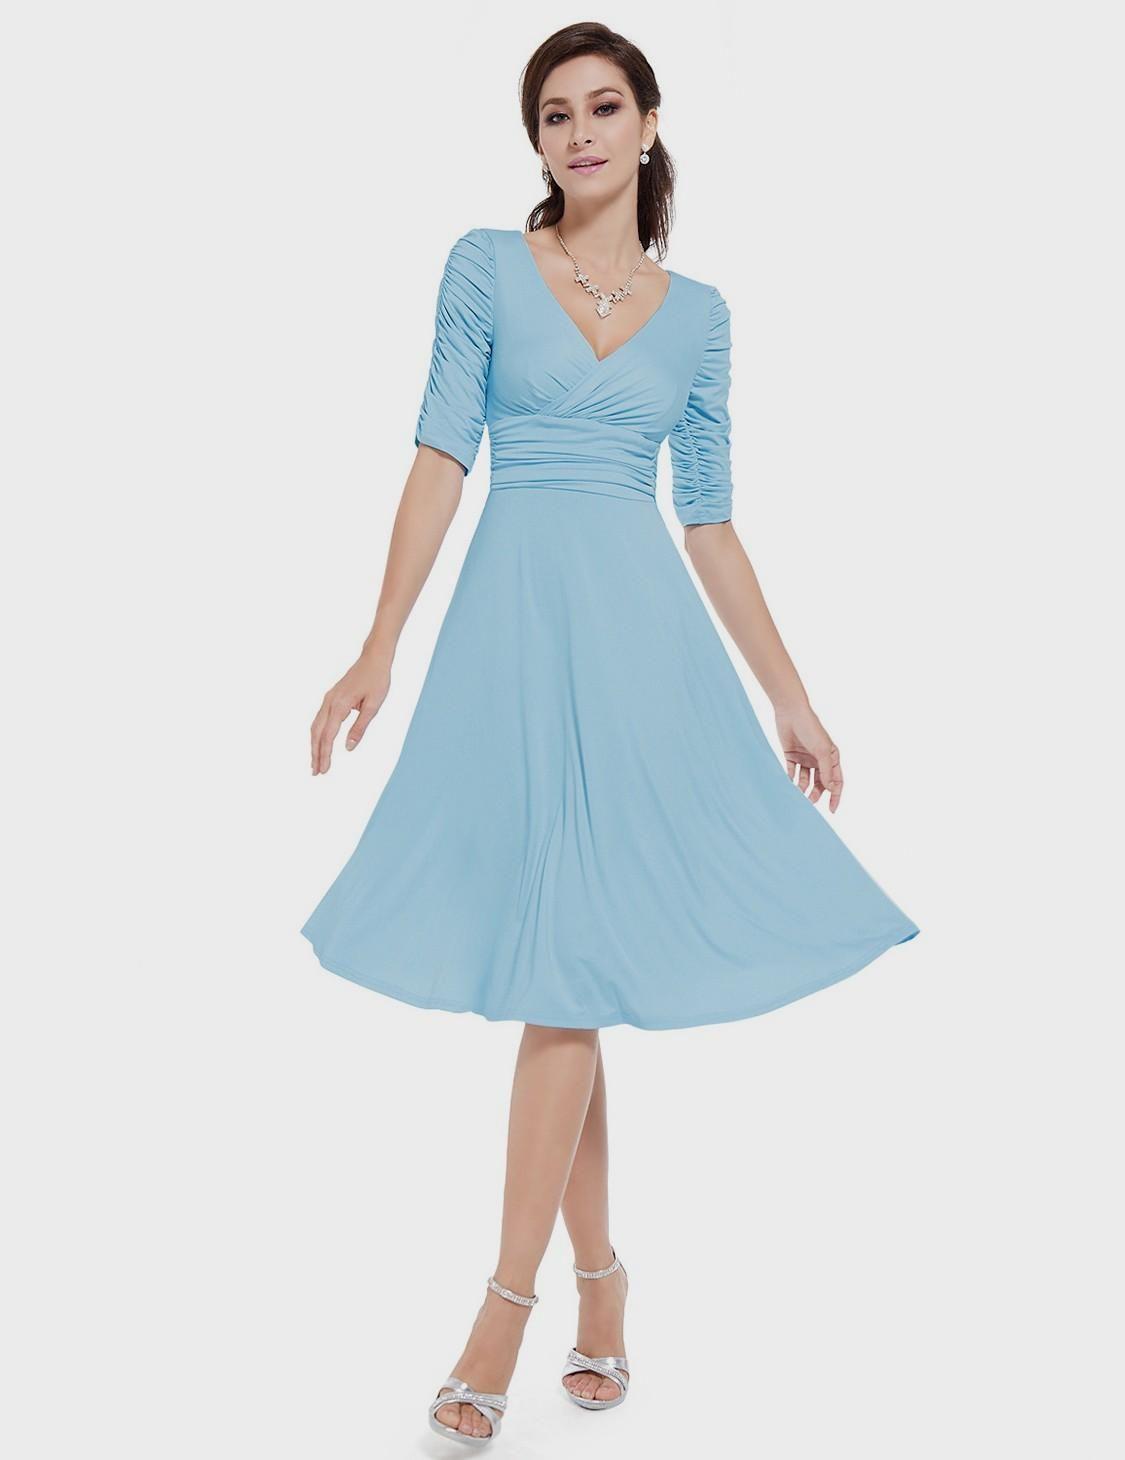 Blue Dress Casual 3 4 Casual Cocktail Dress Light Blue Casual Dress Blue Dress Casual [ 1460 x 1125 Pixel ]